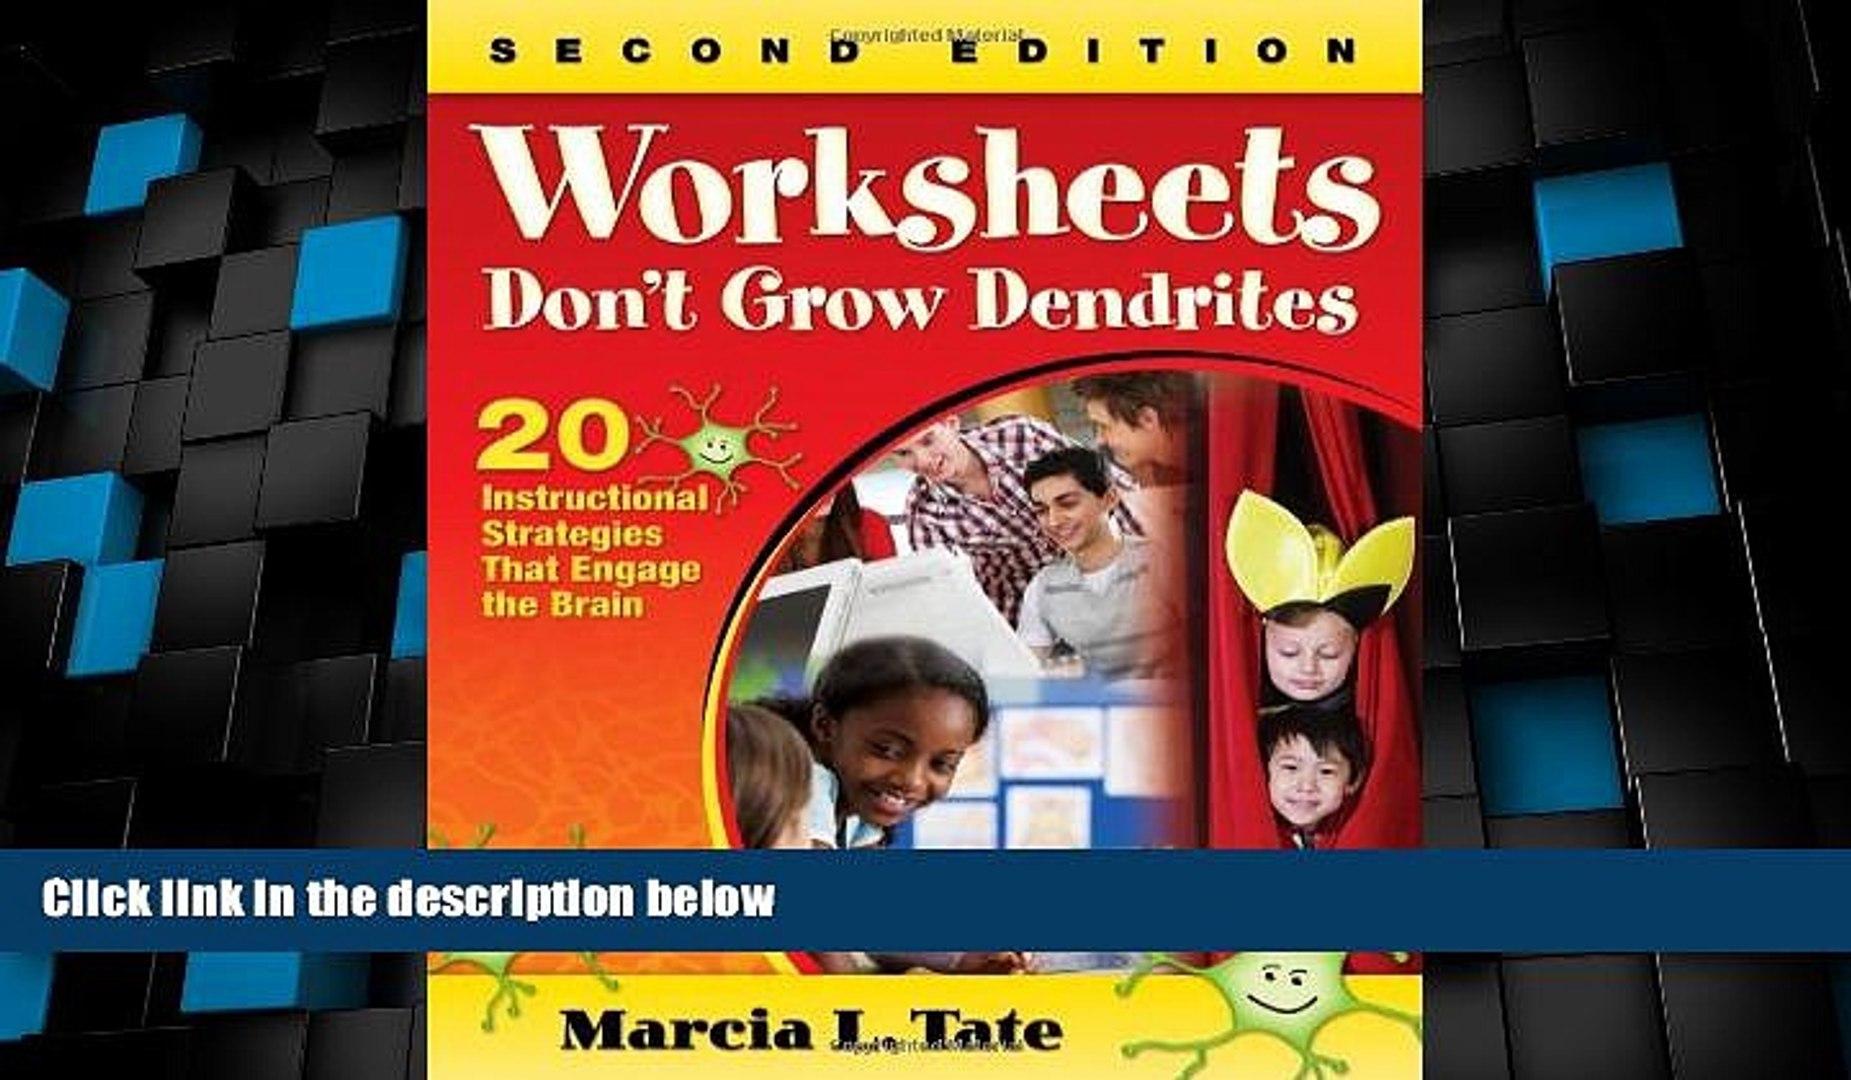 Big Sales Worksheets Don t Grow Dendrites: 20 Instructional ...